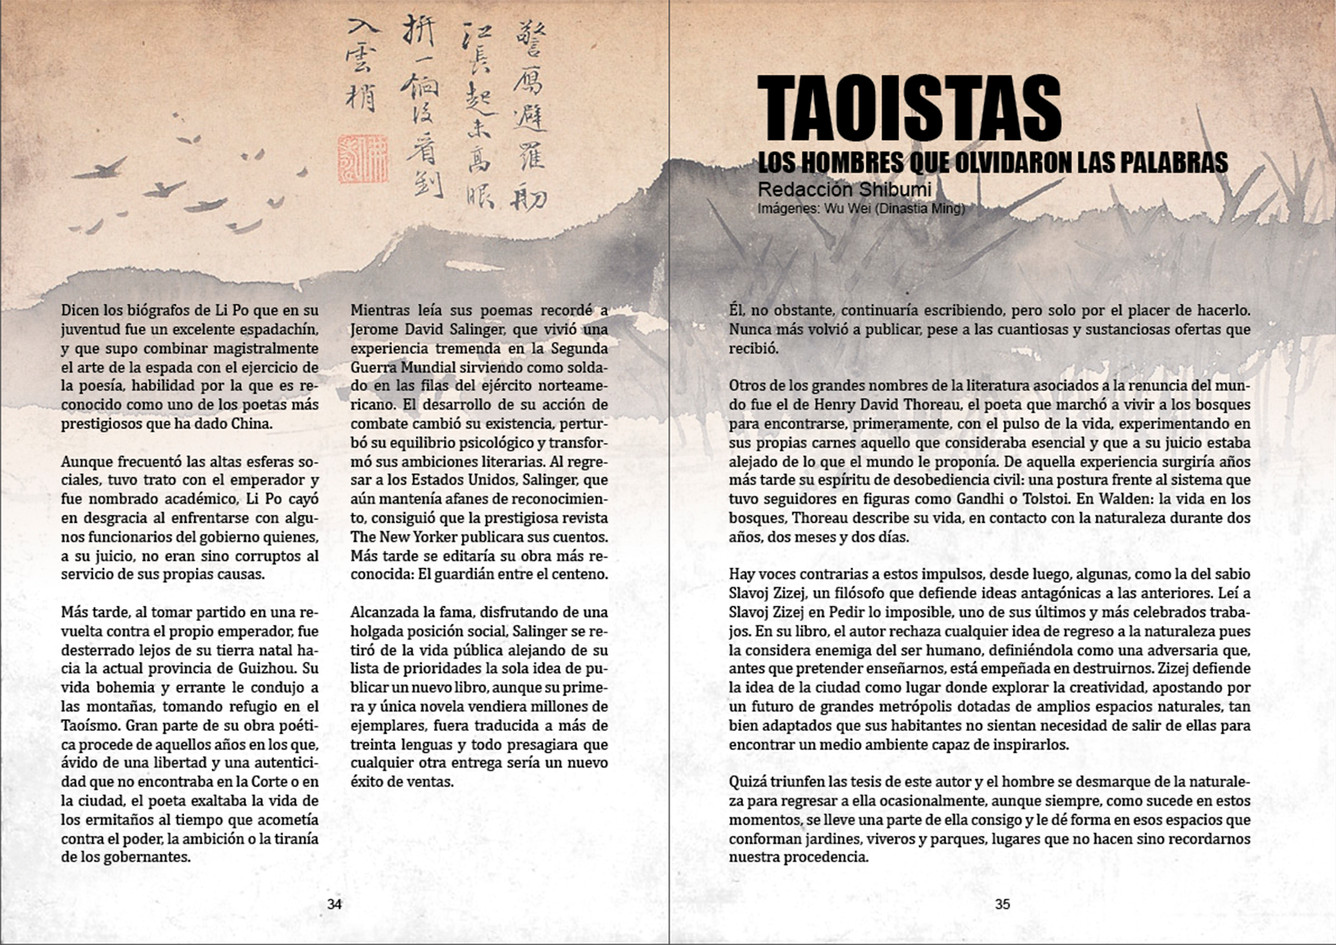 TAOISTAS